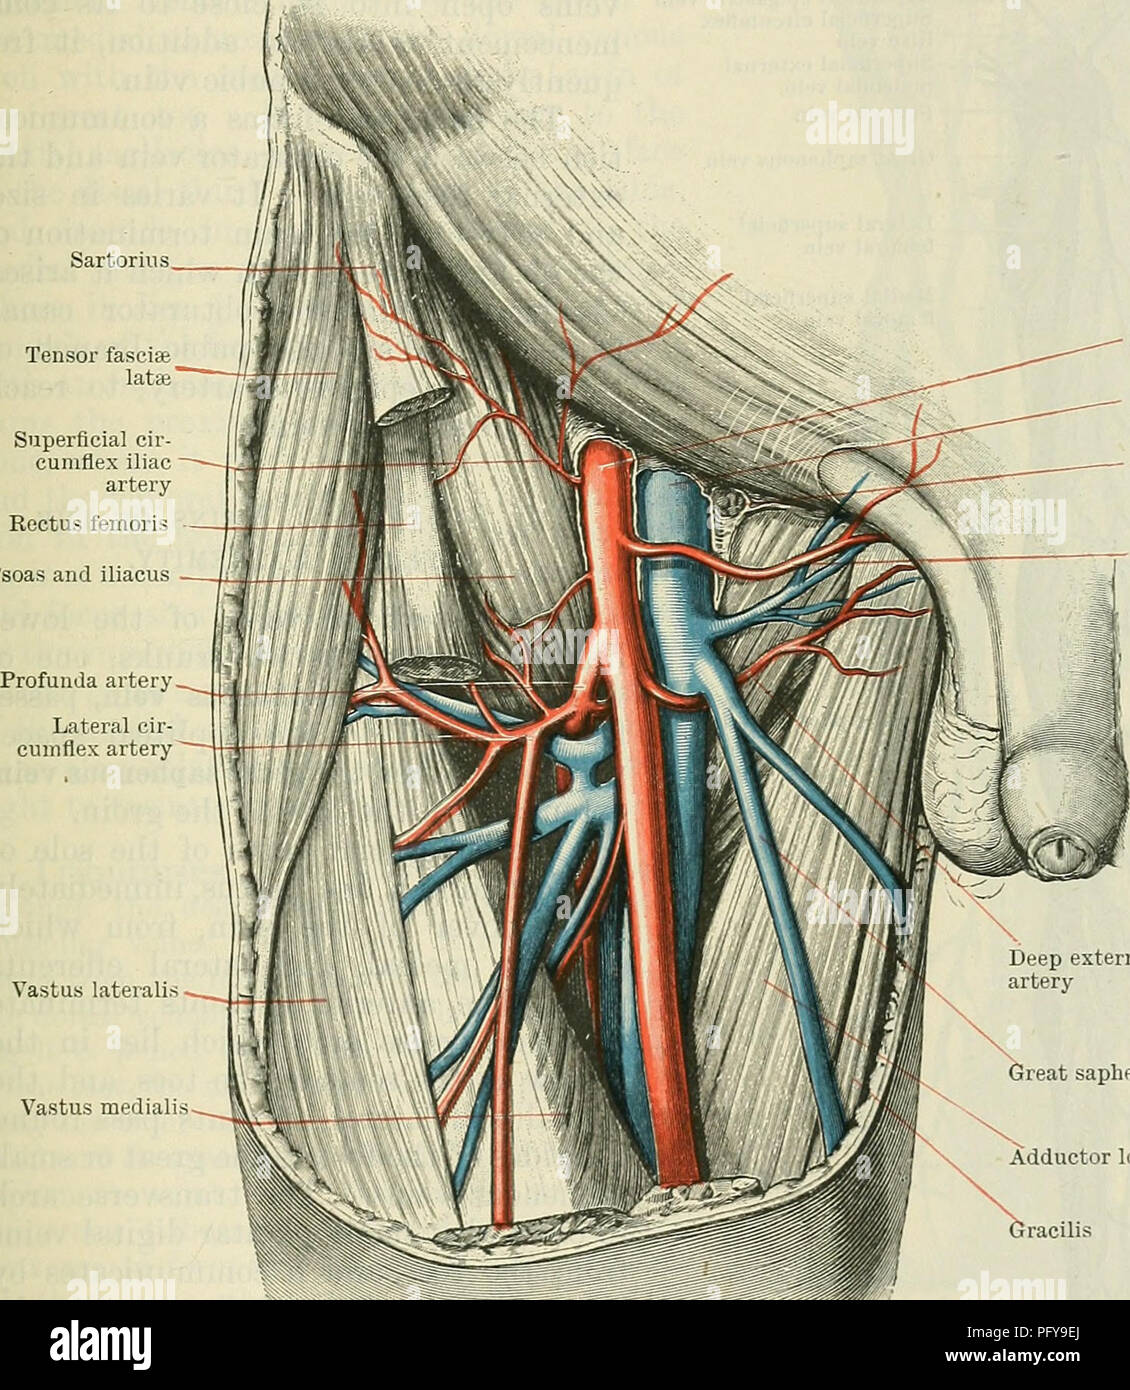 Femoral Artery Stock Photos & Femoral Artery Stock Images - Alamy